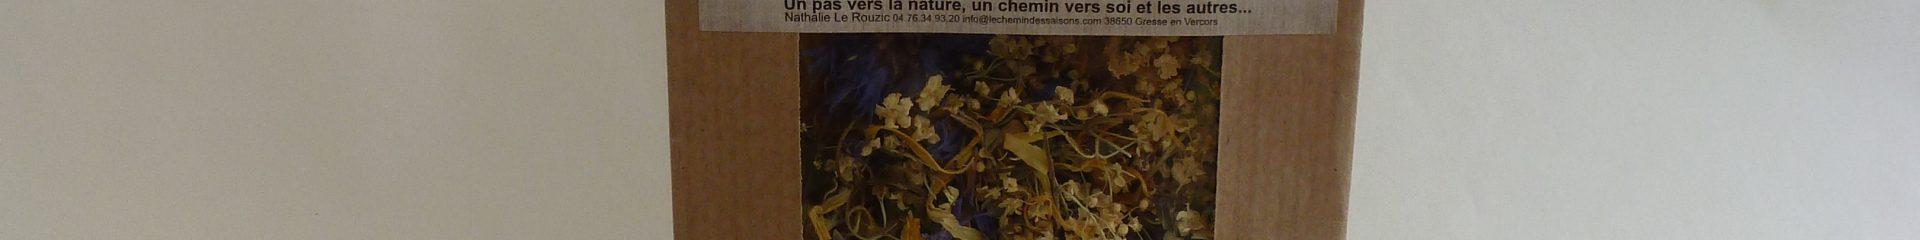 Tisane Plaisir de fleurs 25g